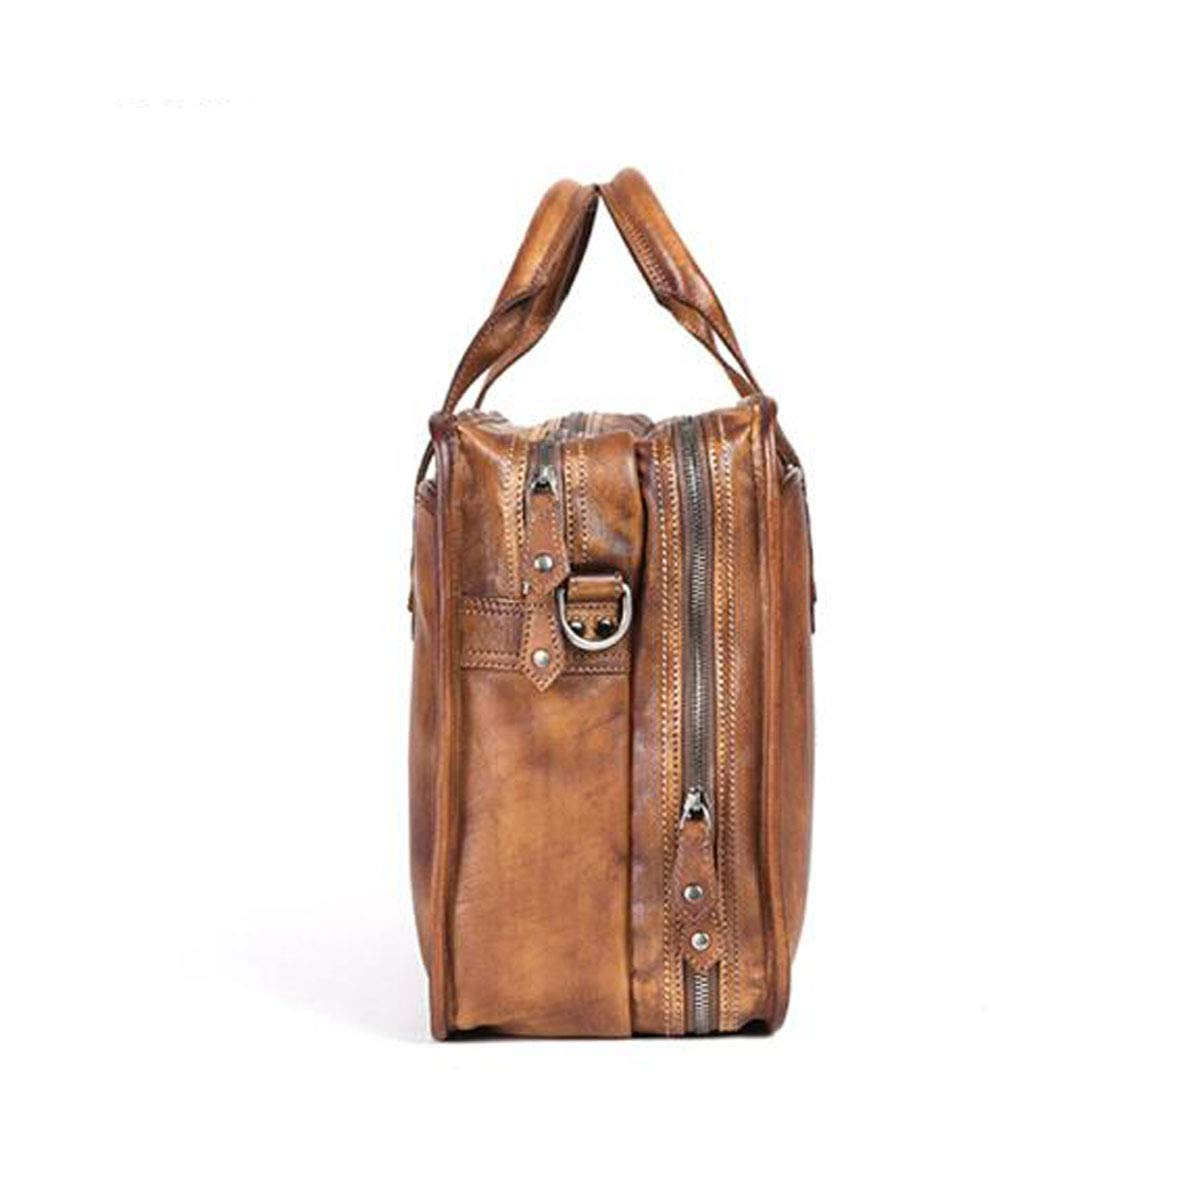 Easy to use Jielongtongxun Briefcase,Vintage Leather Handbag Mens Computer Bag